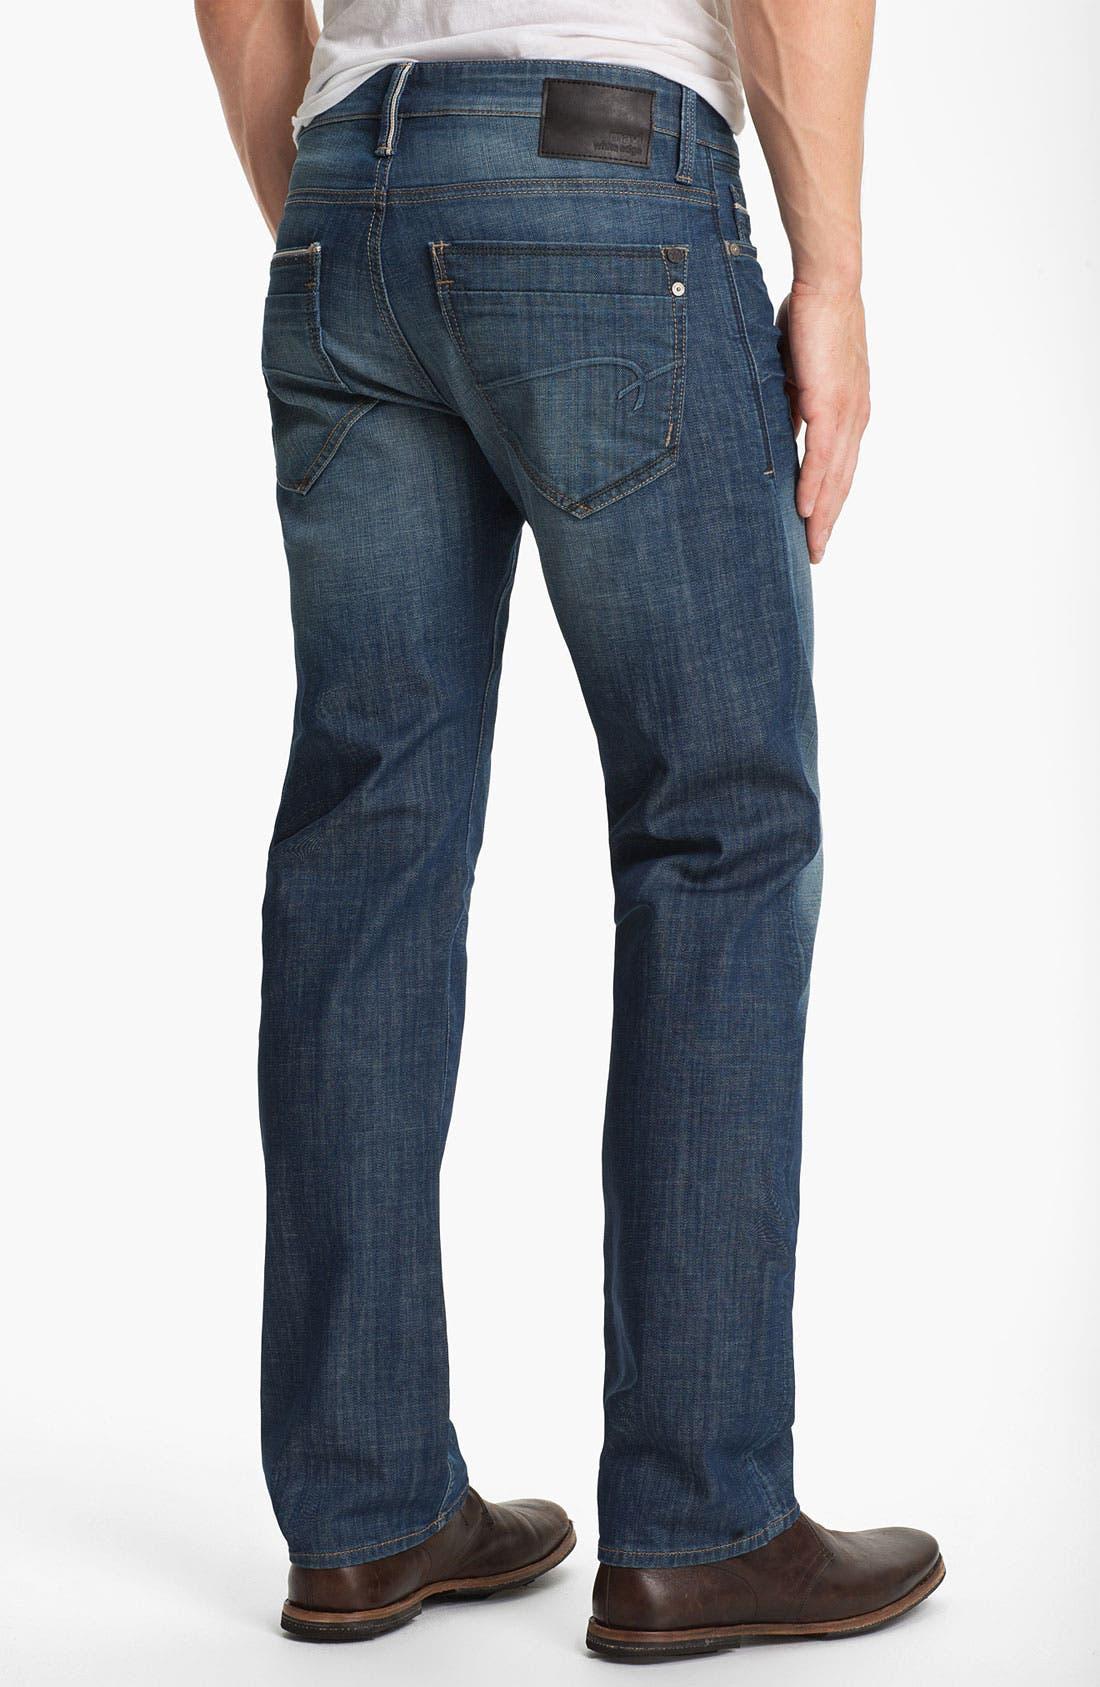 Alternate Image 1 Selected - Mavi Jeans 'Zach' Straight Leg Jeans (Mid White Edge)